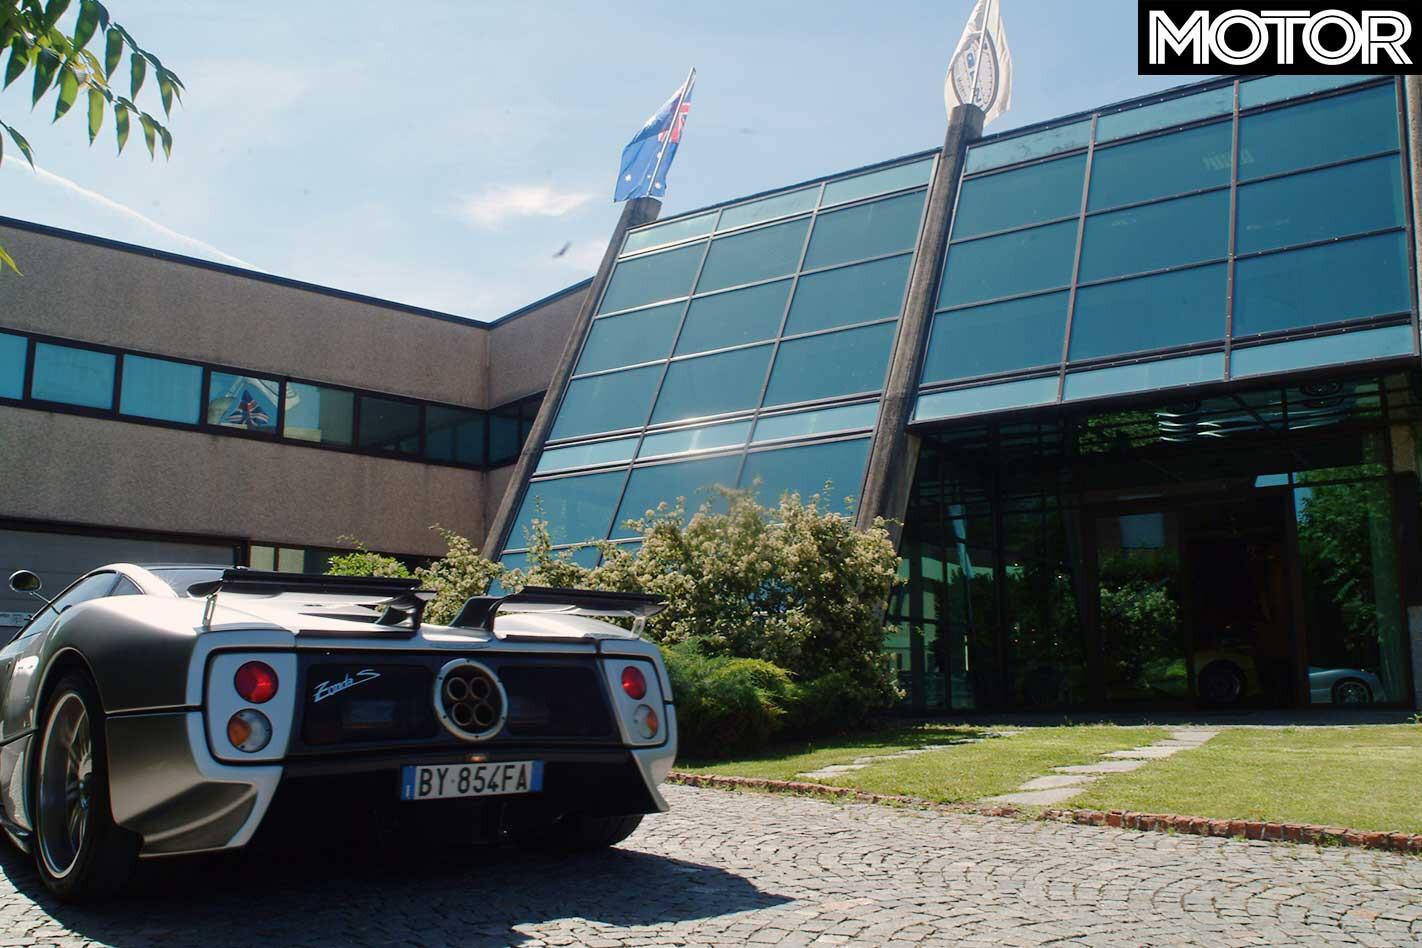 2004 Pagani Zonda C 12 S Factory Jpg